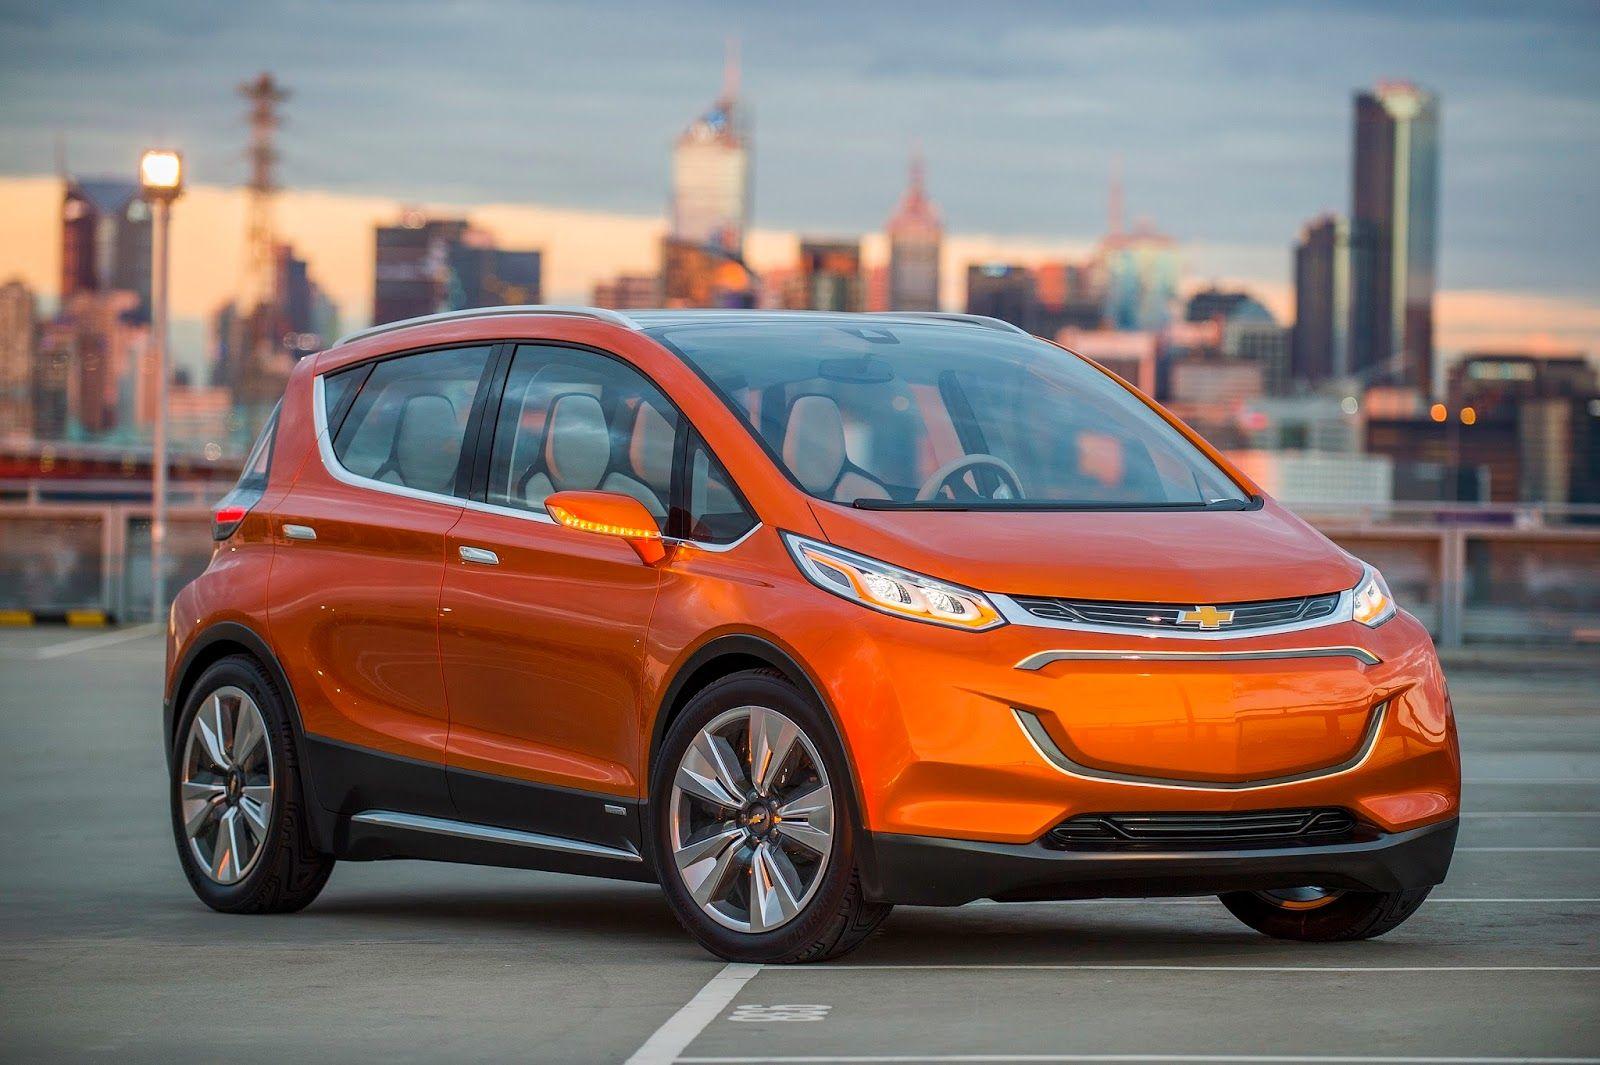 auto breakdown chevrolet bolt electric car of the future cars rh pinterest ca